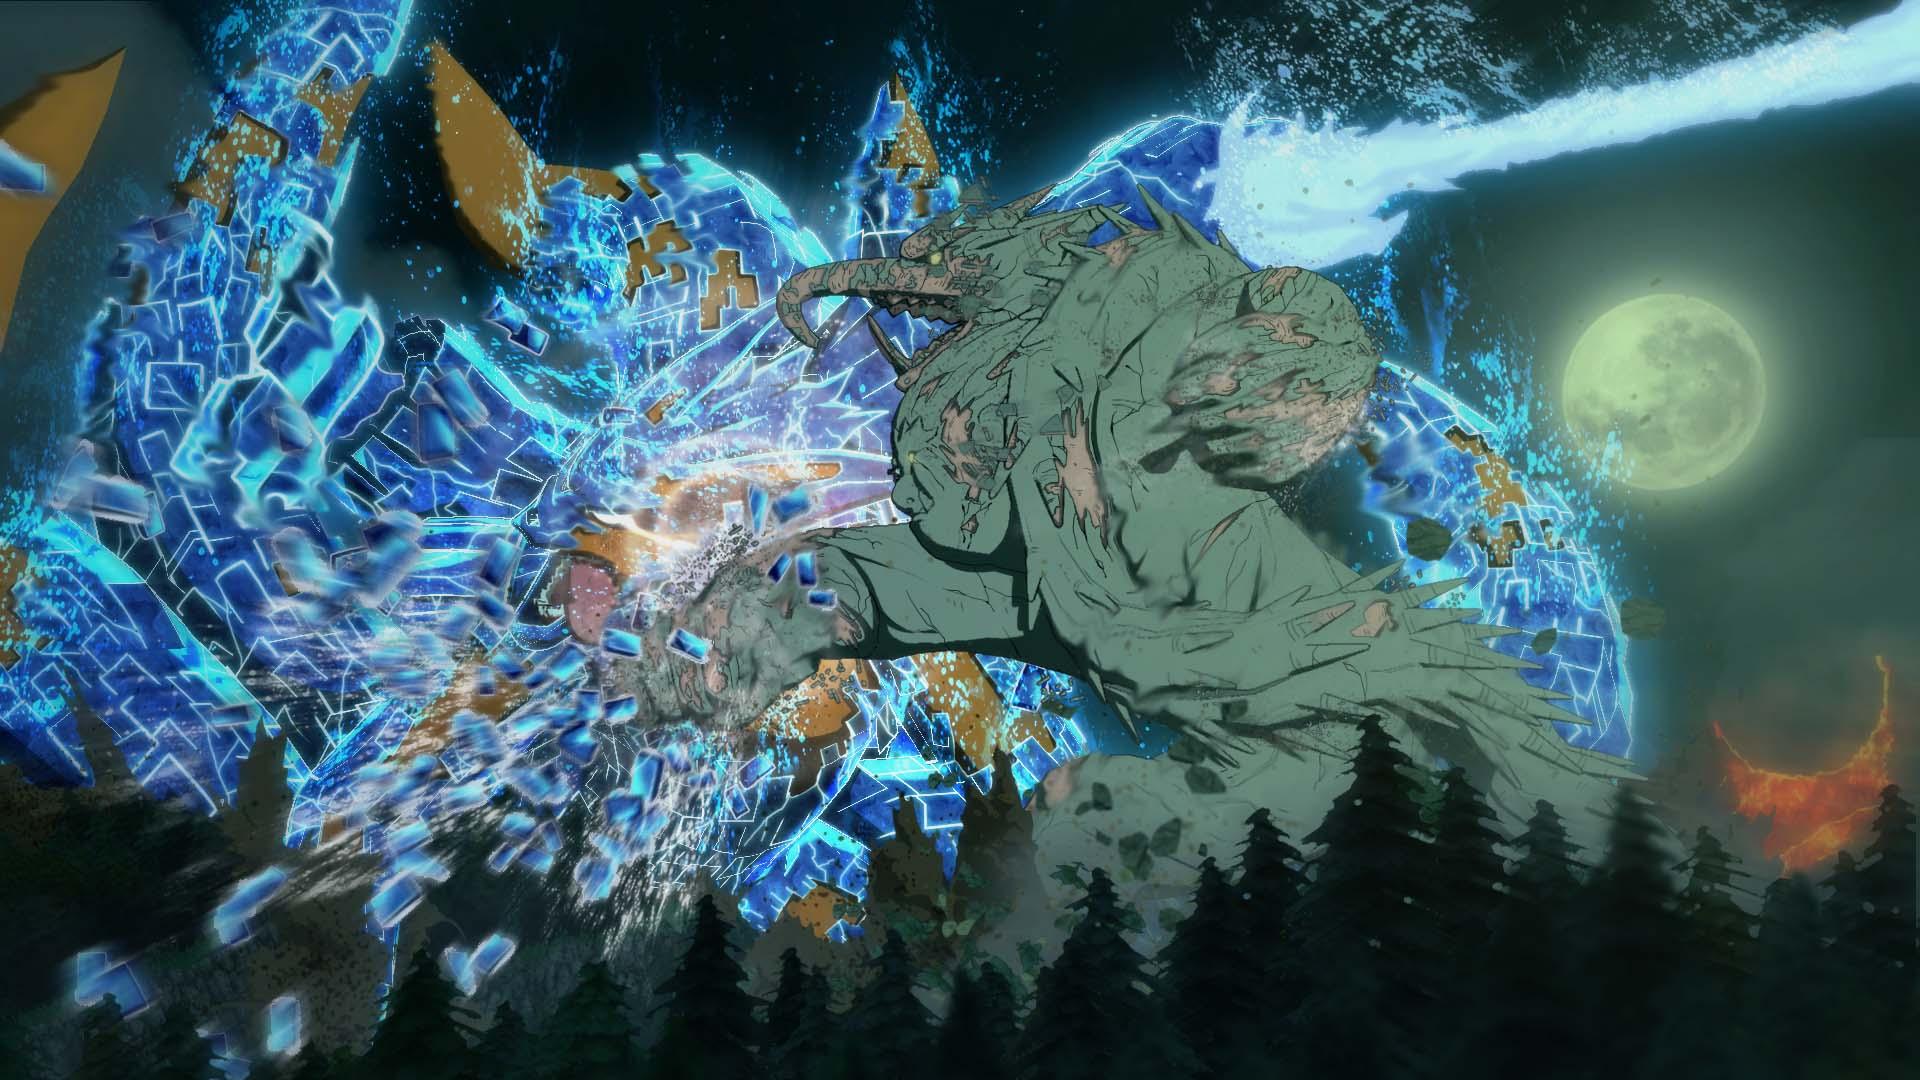 Naruto Shippuden: Ultimate Ninja Storm 4 Kurama in Susanoo armor screenshot